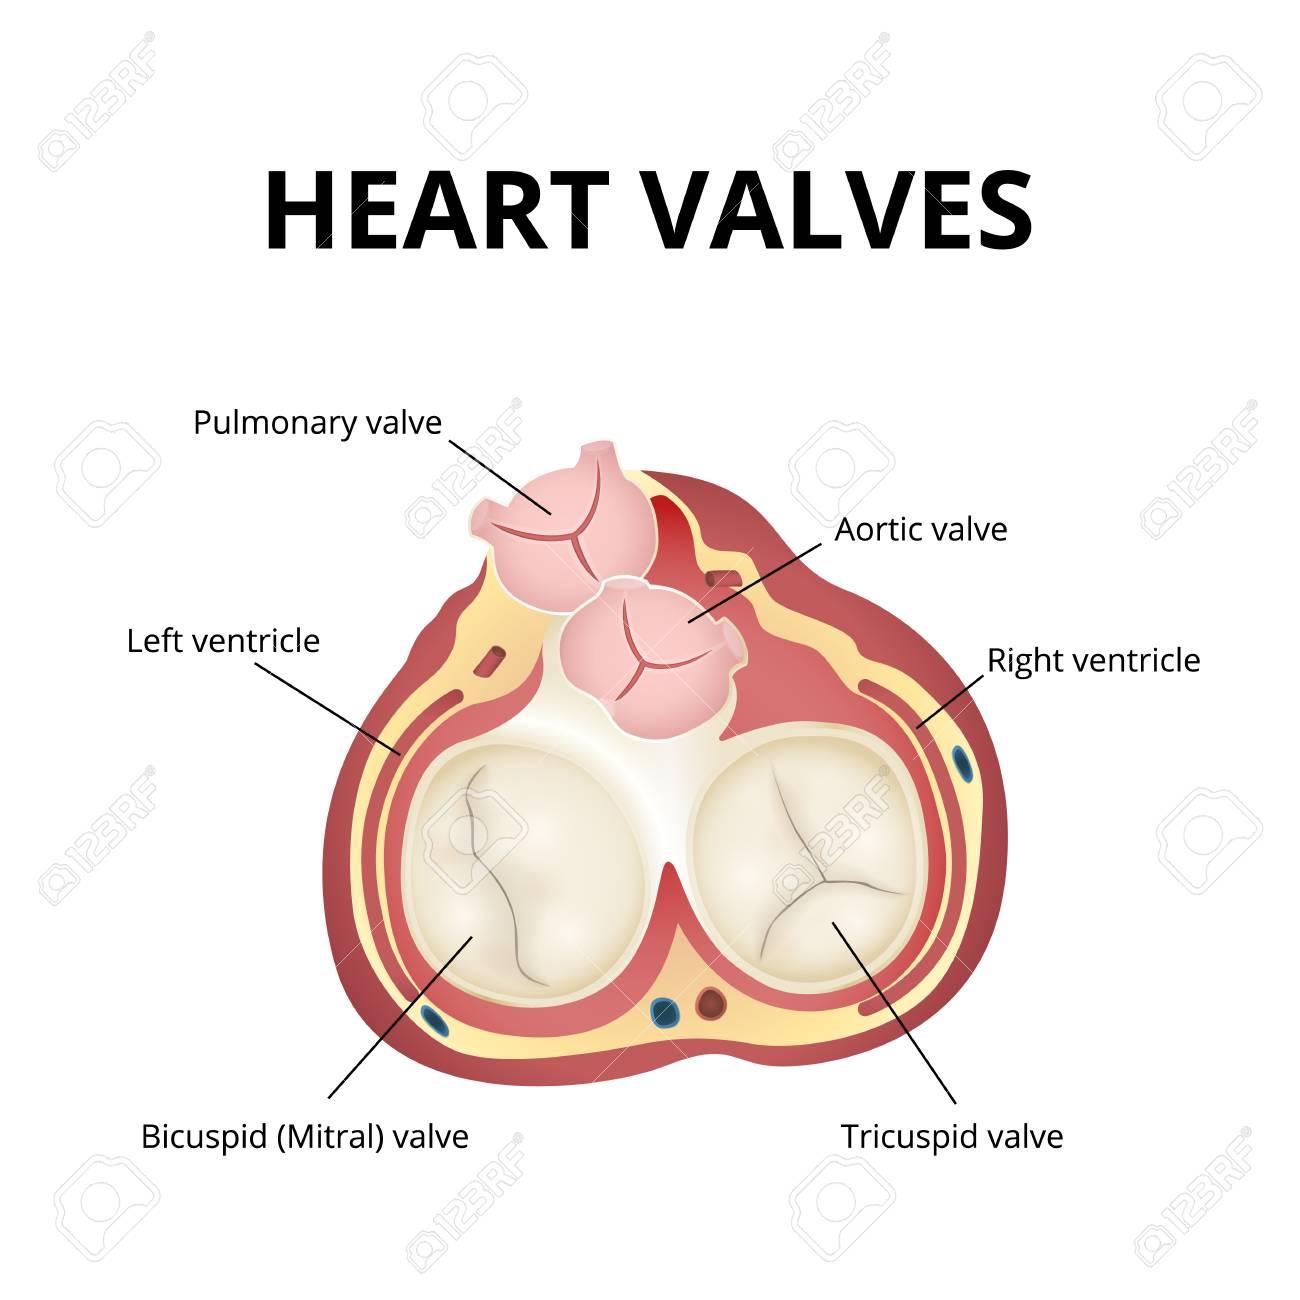 Heart Valves Anatomy Infographic Vector Illustration Royalty Free